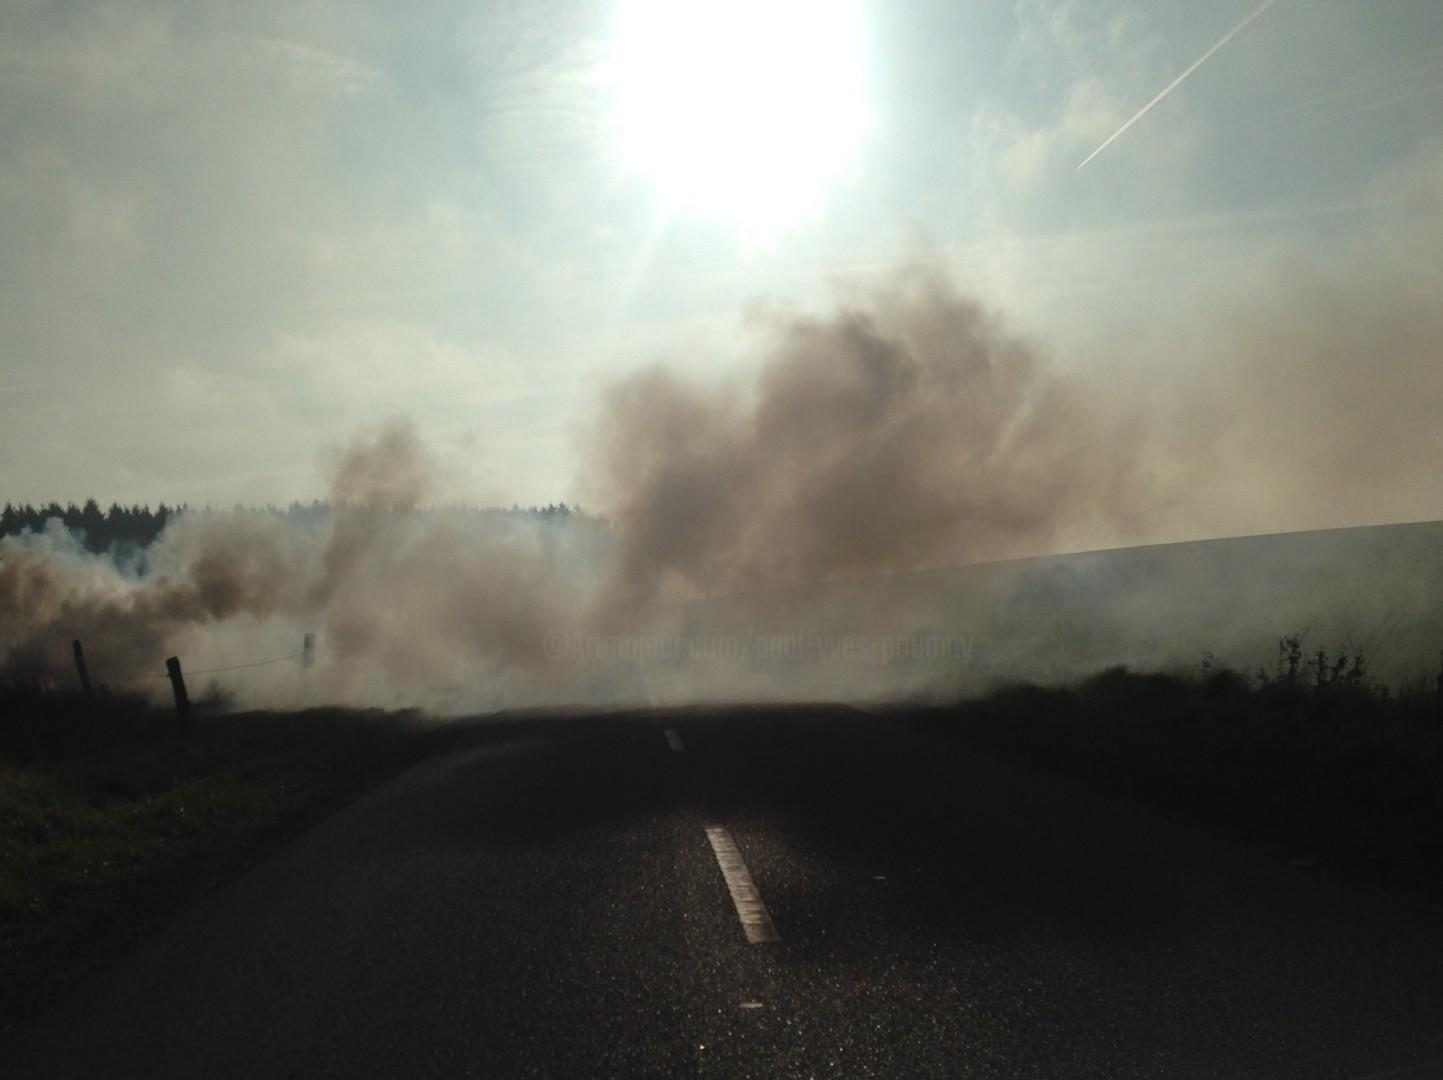 Paul Yves Poumay - smoke-on-the-road.jpg